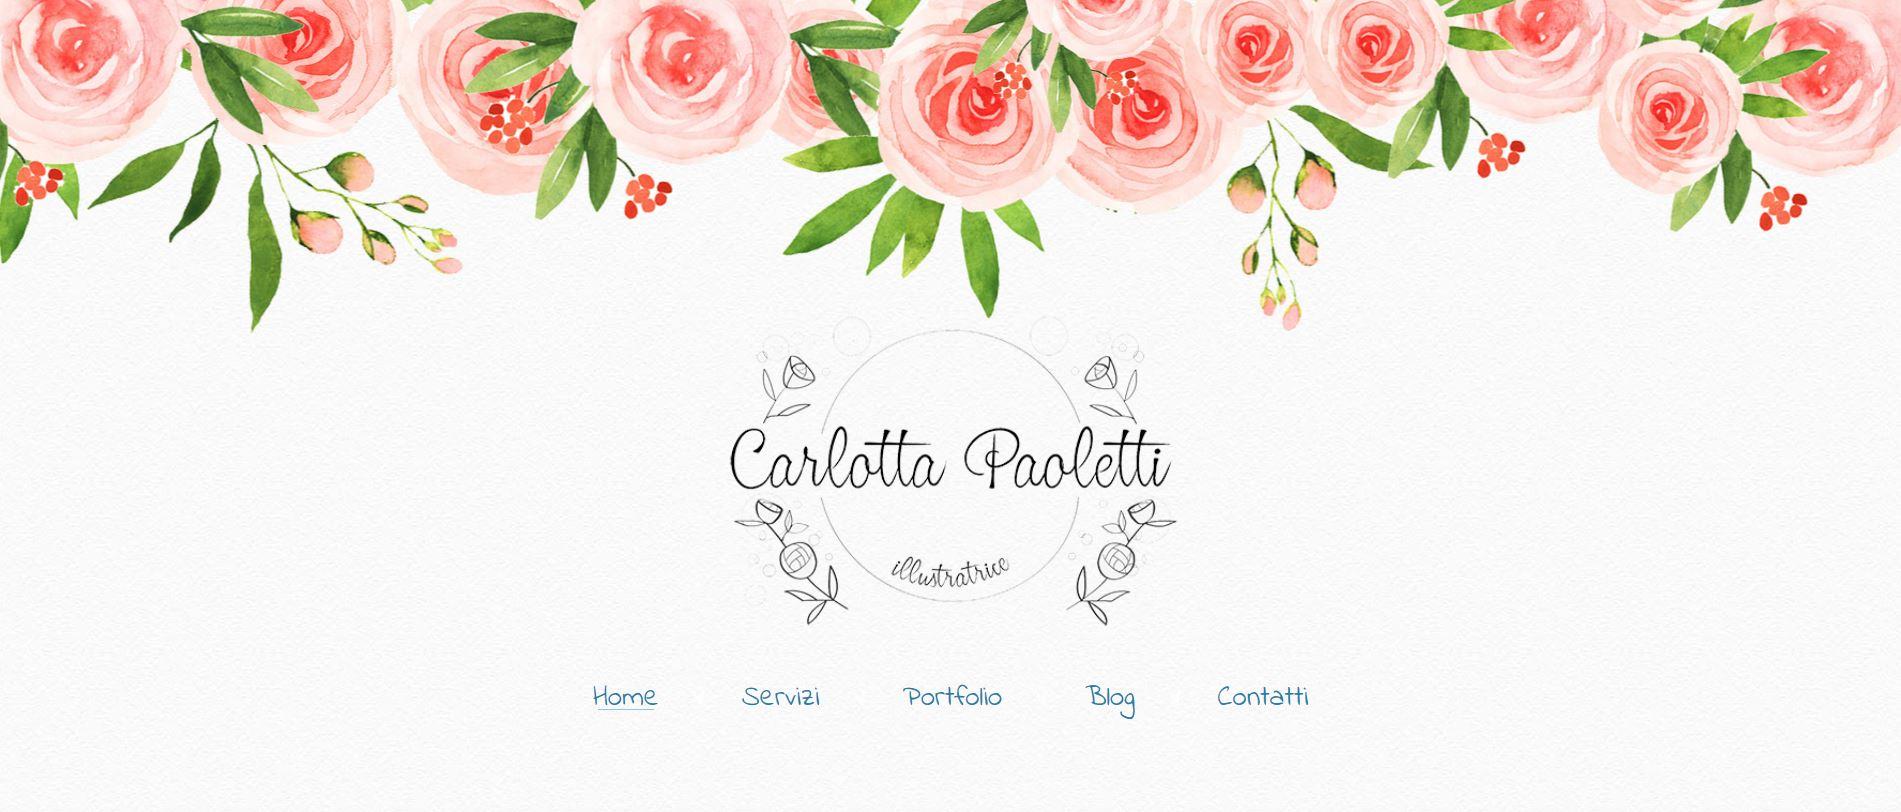 carlotta-paoletti-hirostudios-001